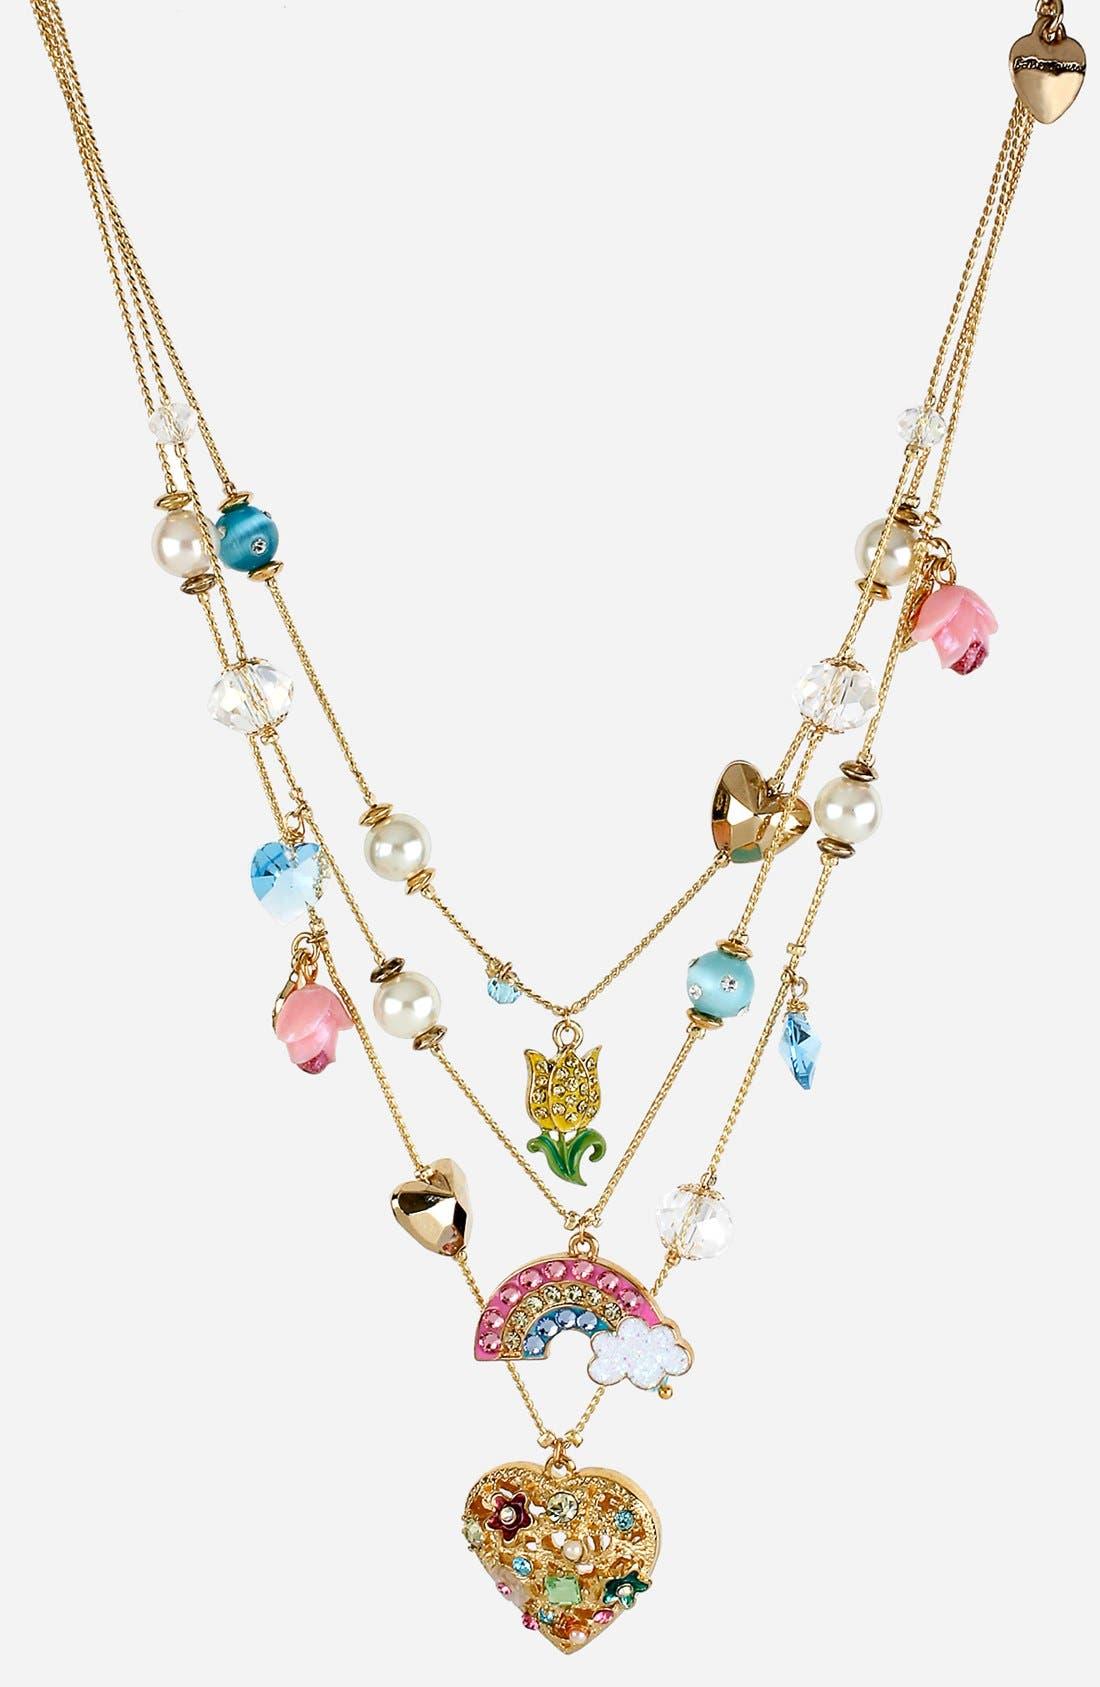 Alternate Image 1 Selected - Betsey Johnson 'Fairyland' Multistrand Charm Necklace